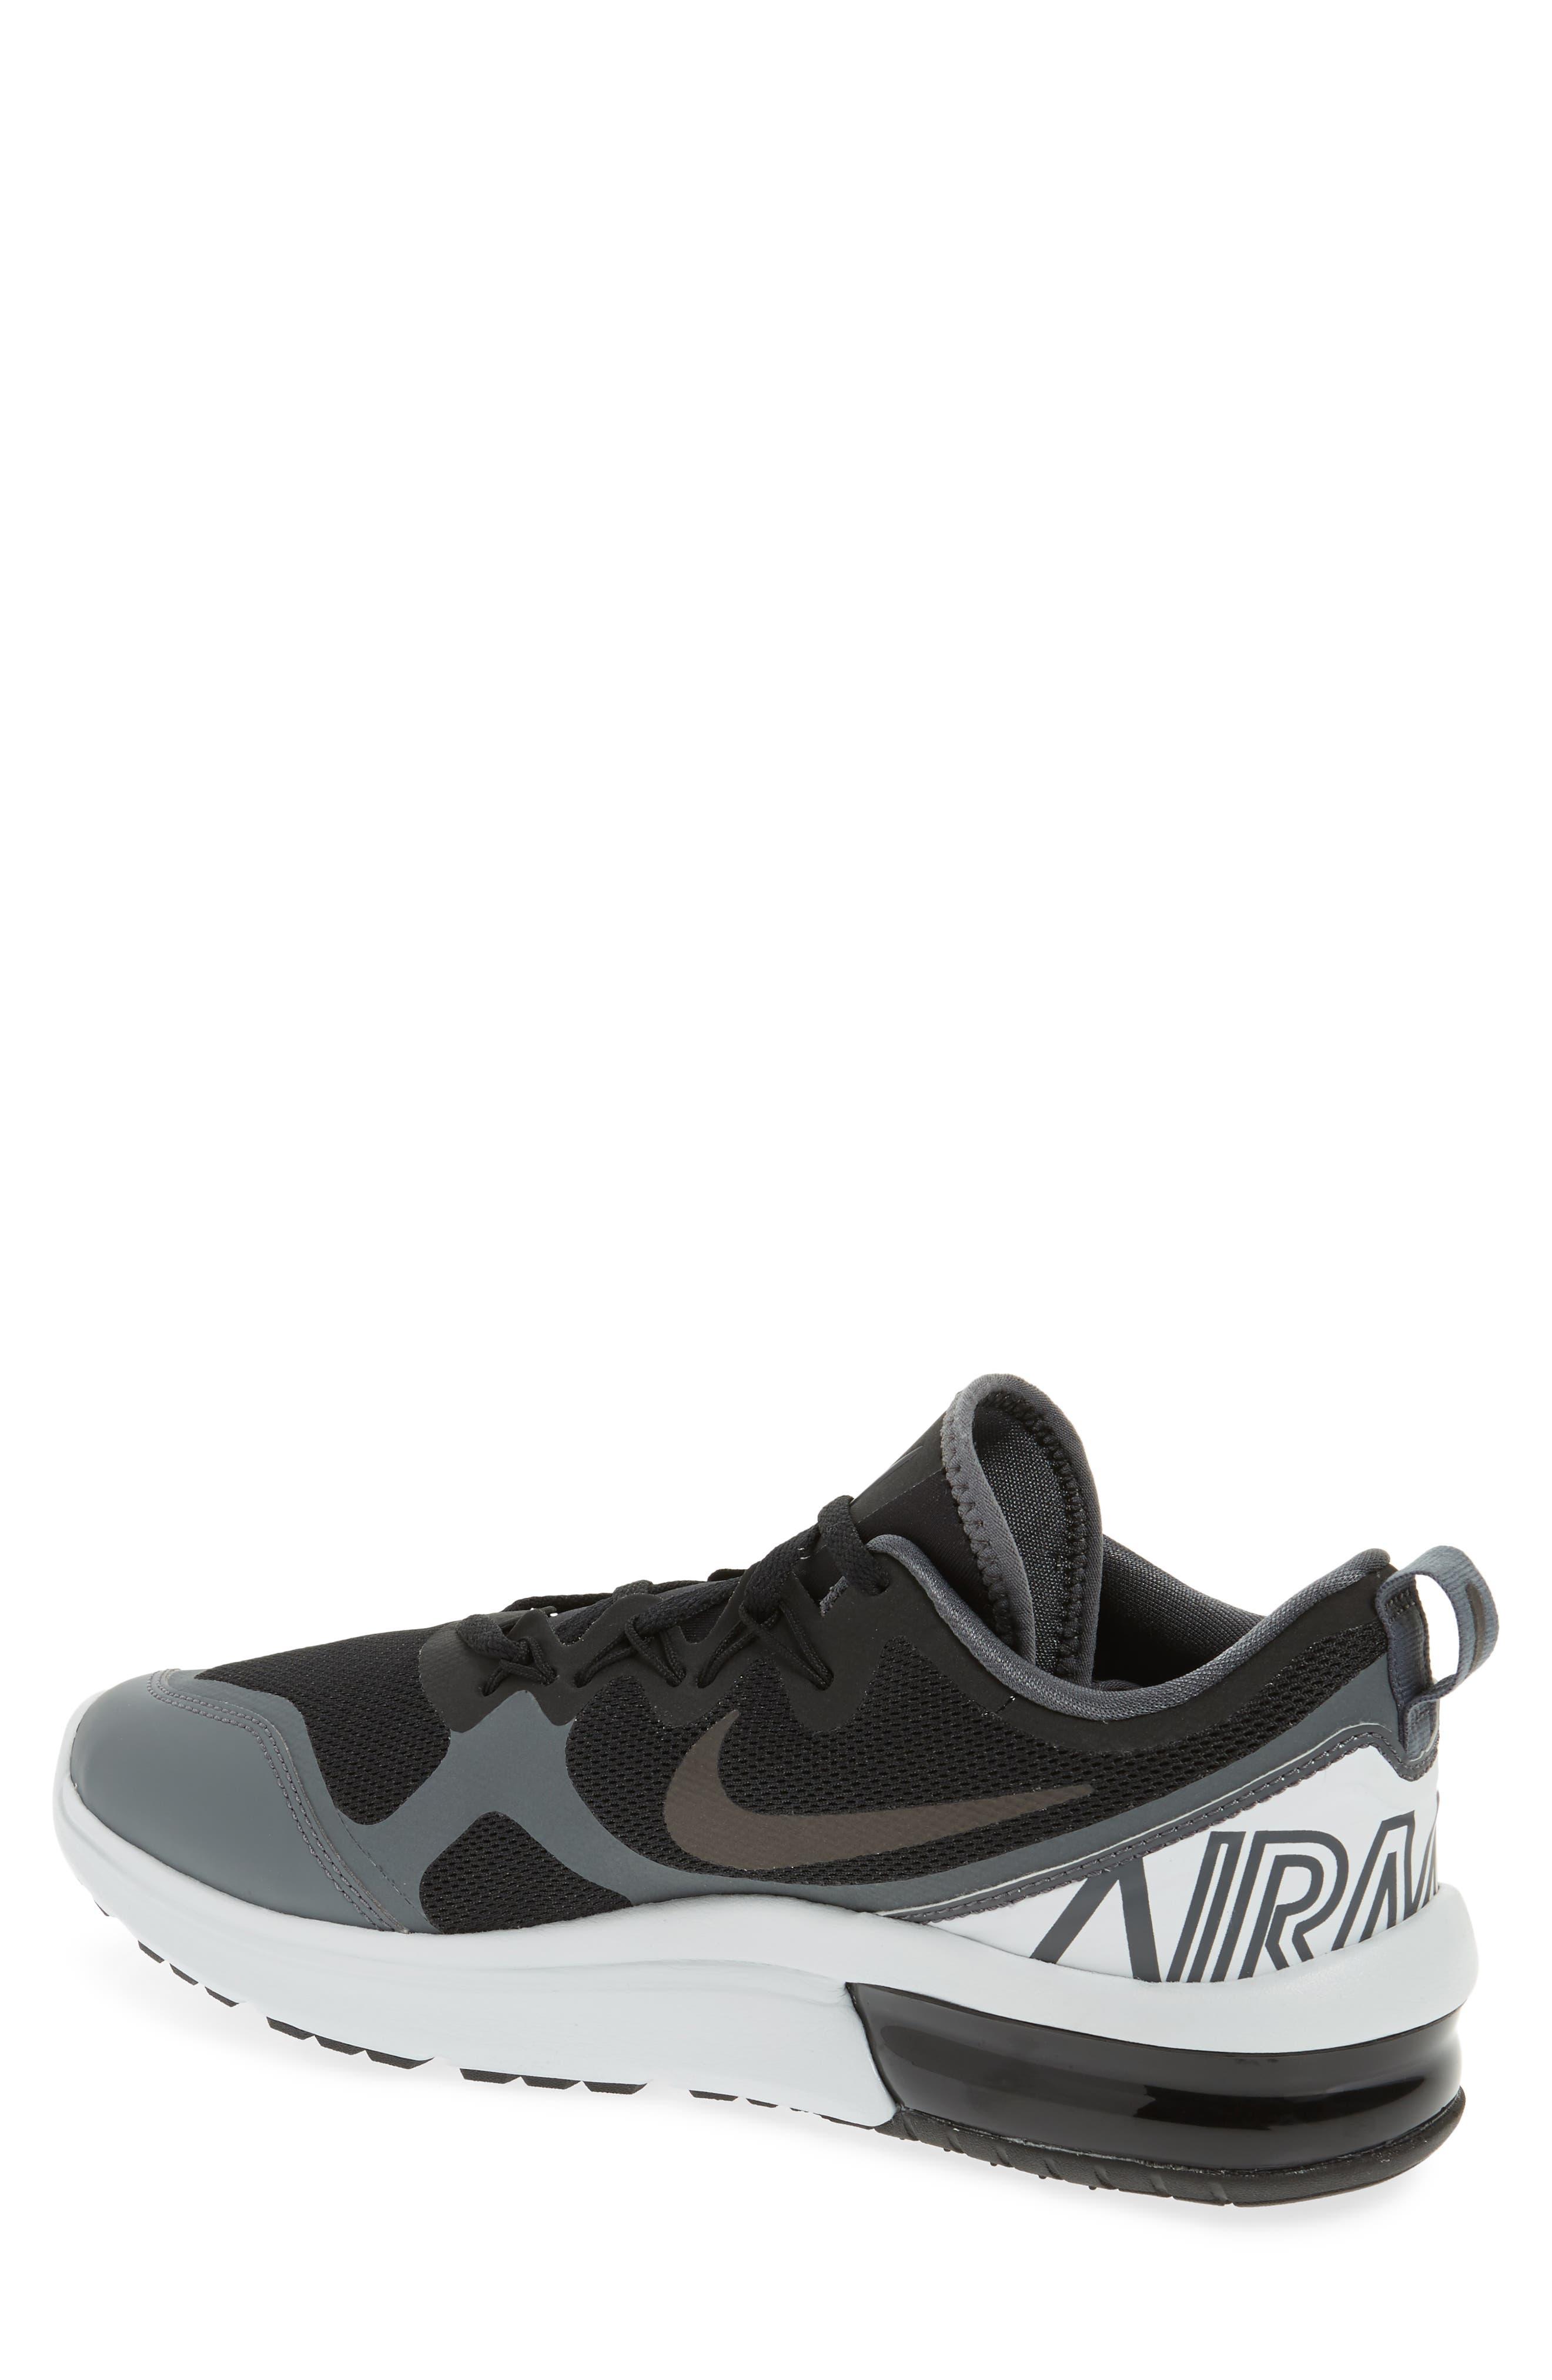 Air Max Fury Running Shoe,                             Alternate thumbnail 2, color,                             009